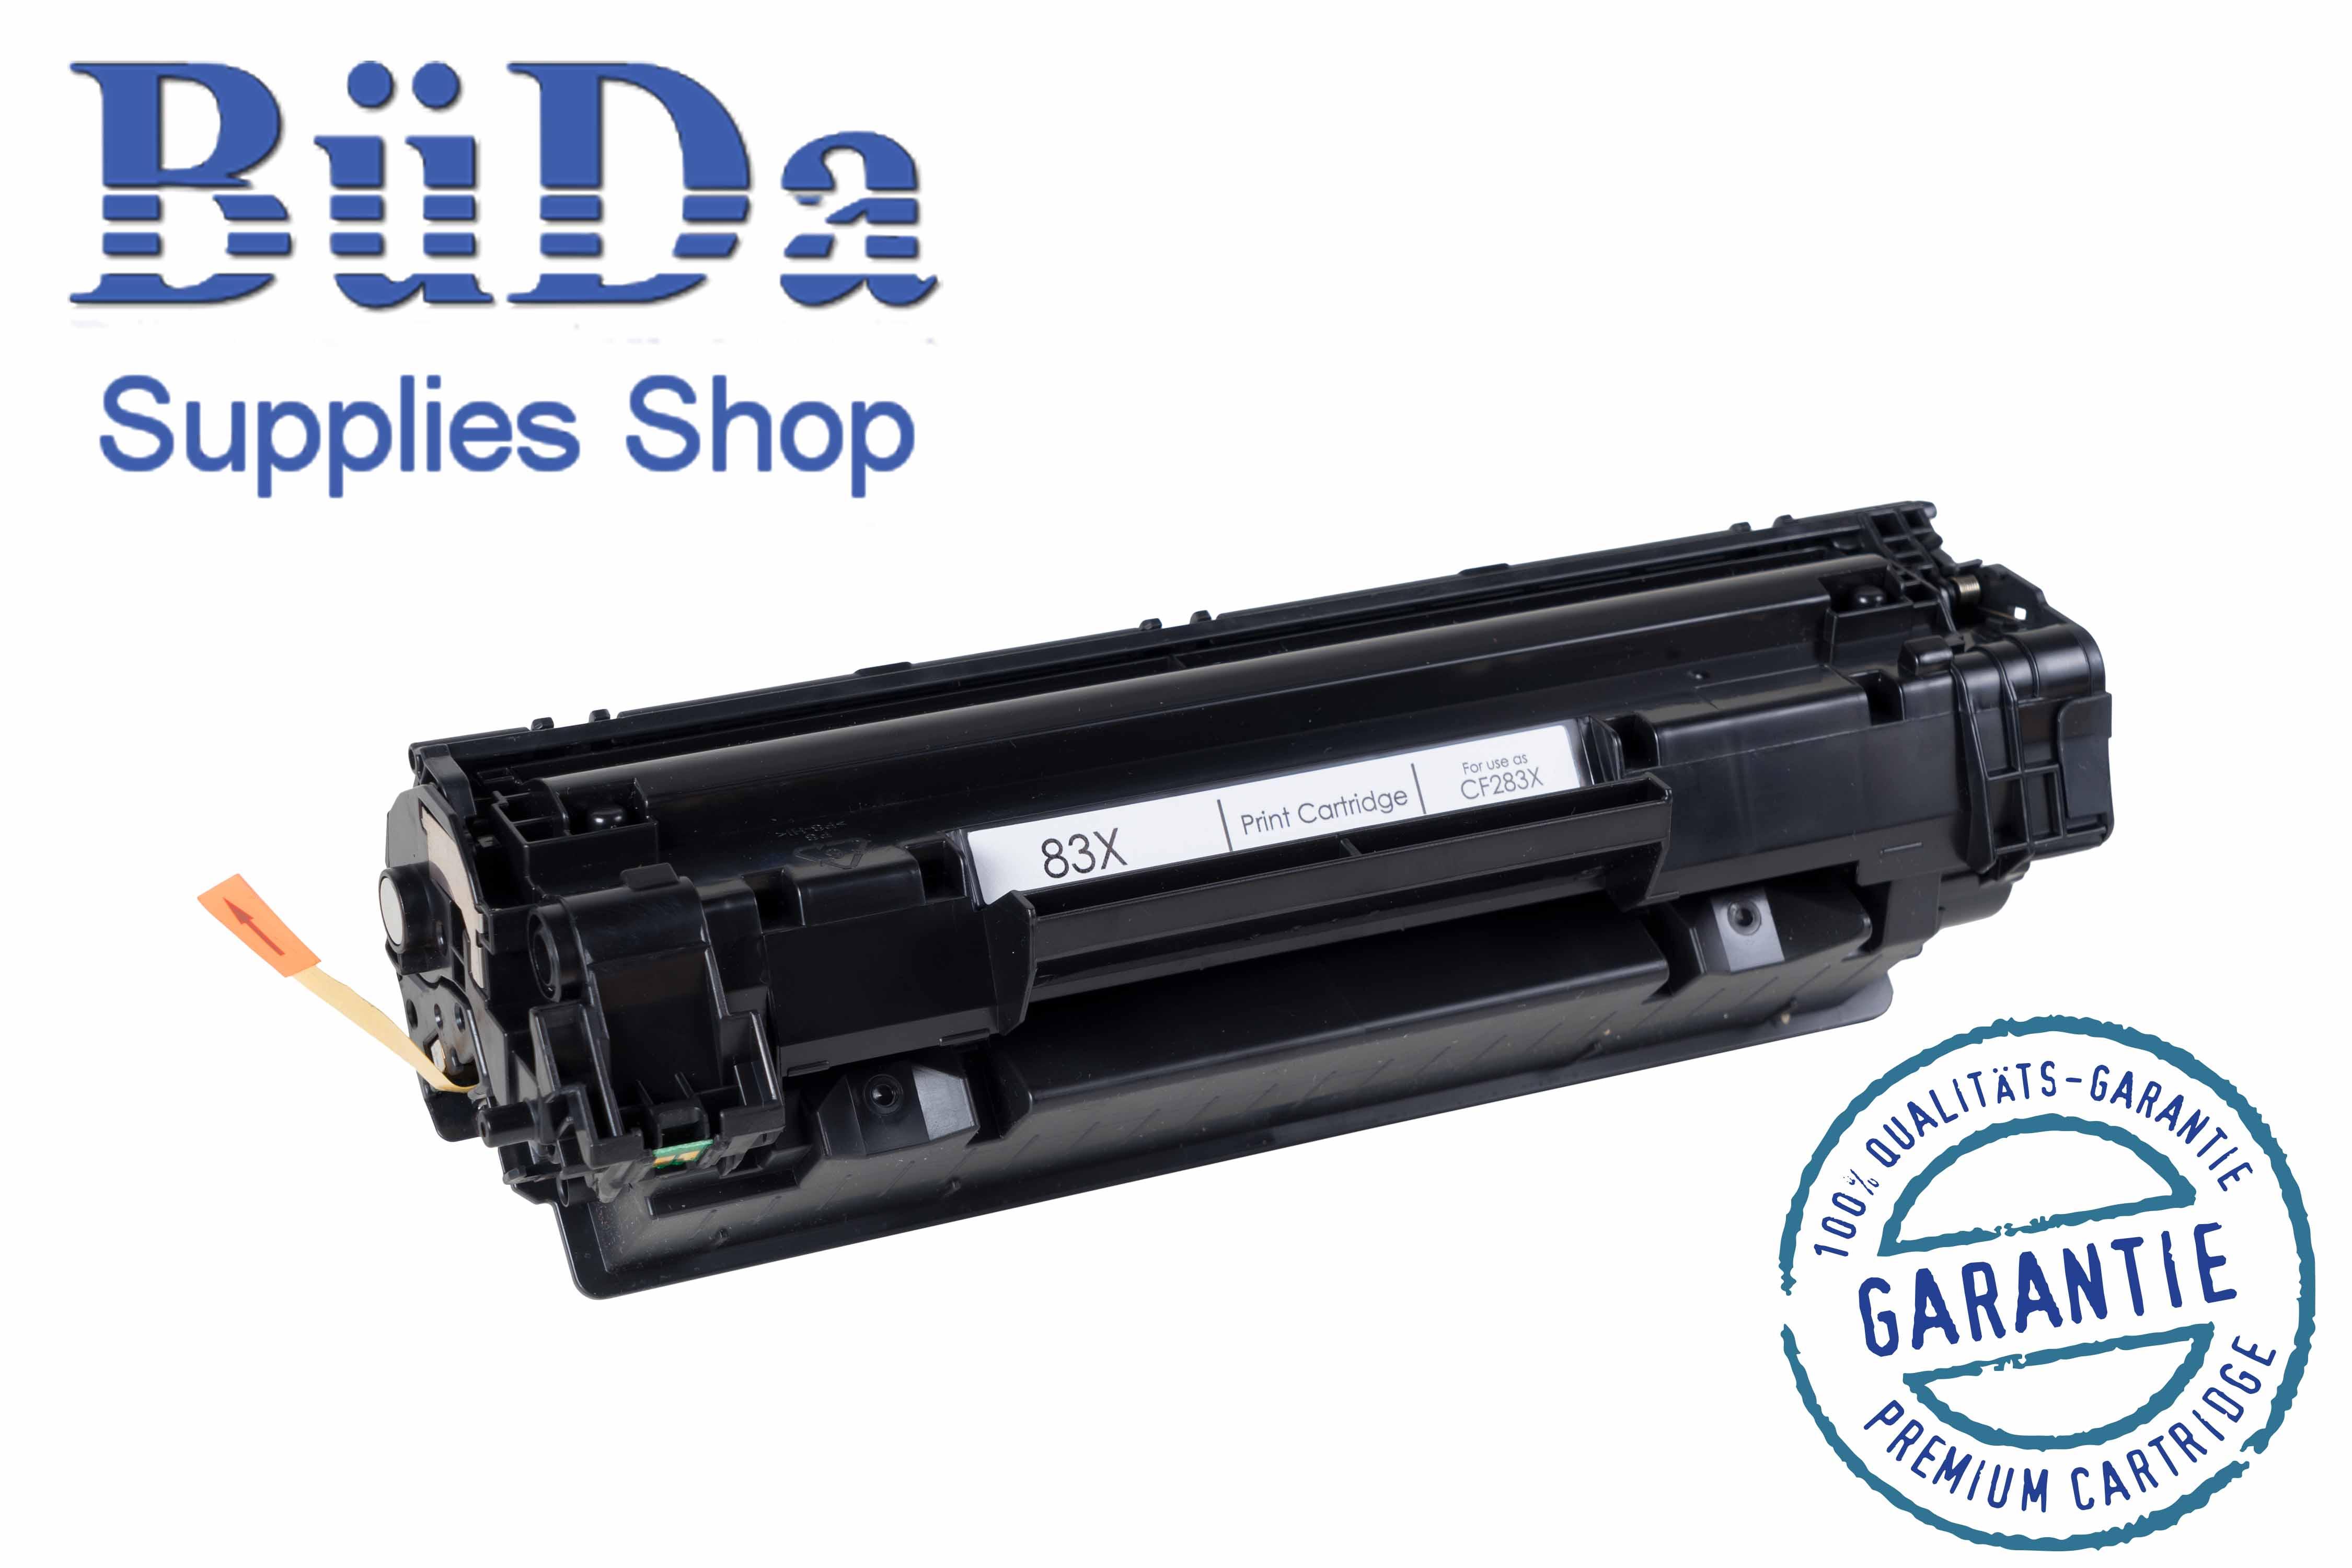 Toner-Modul komp. zu CF283X black 2200 Seiten